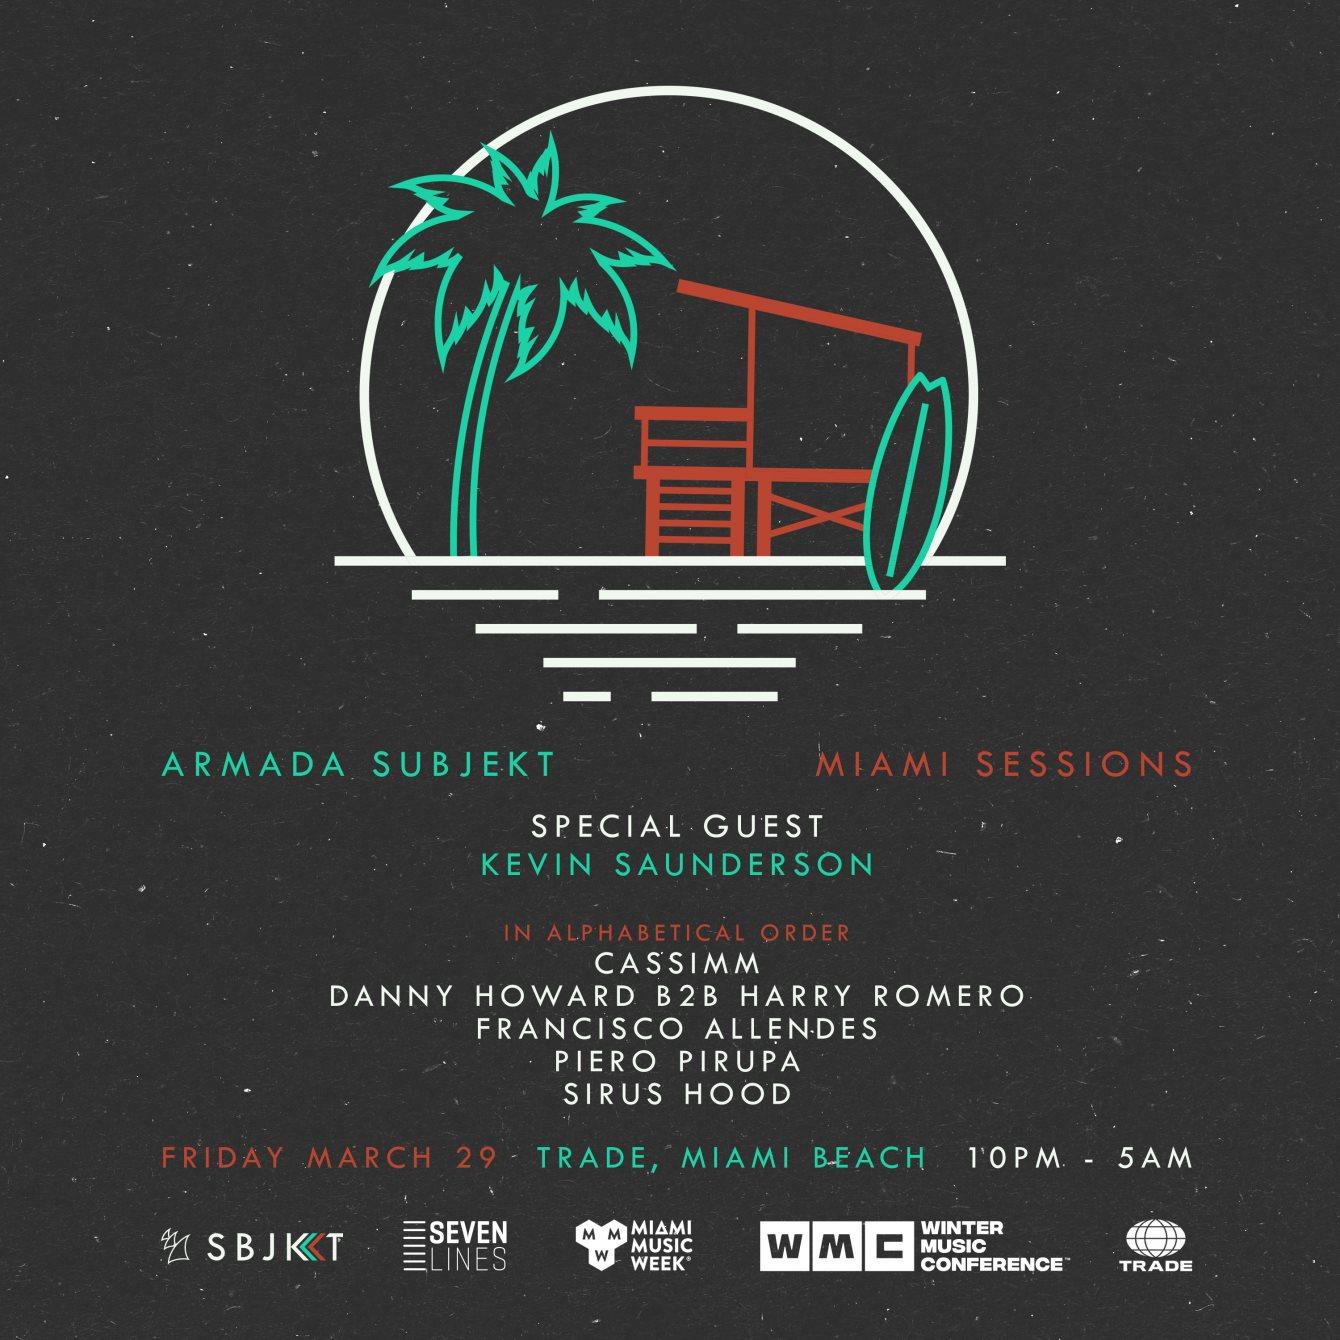 Armada Subjekt - Miami Sessions - Flyer front